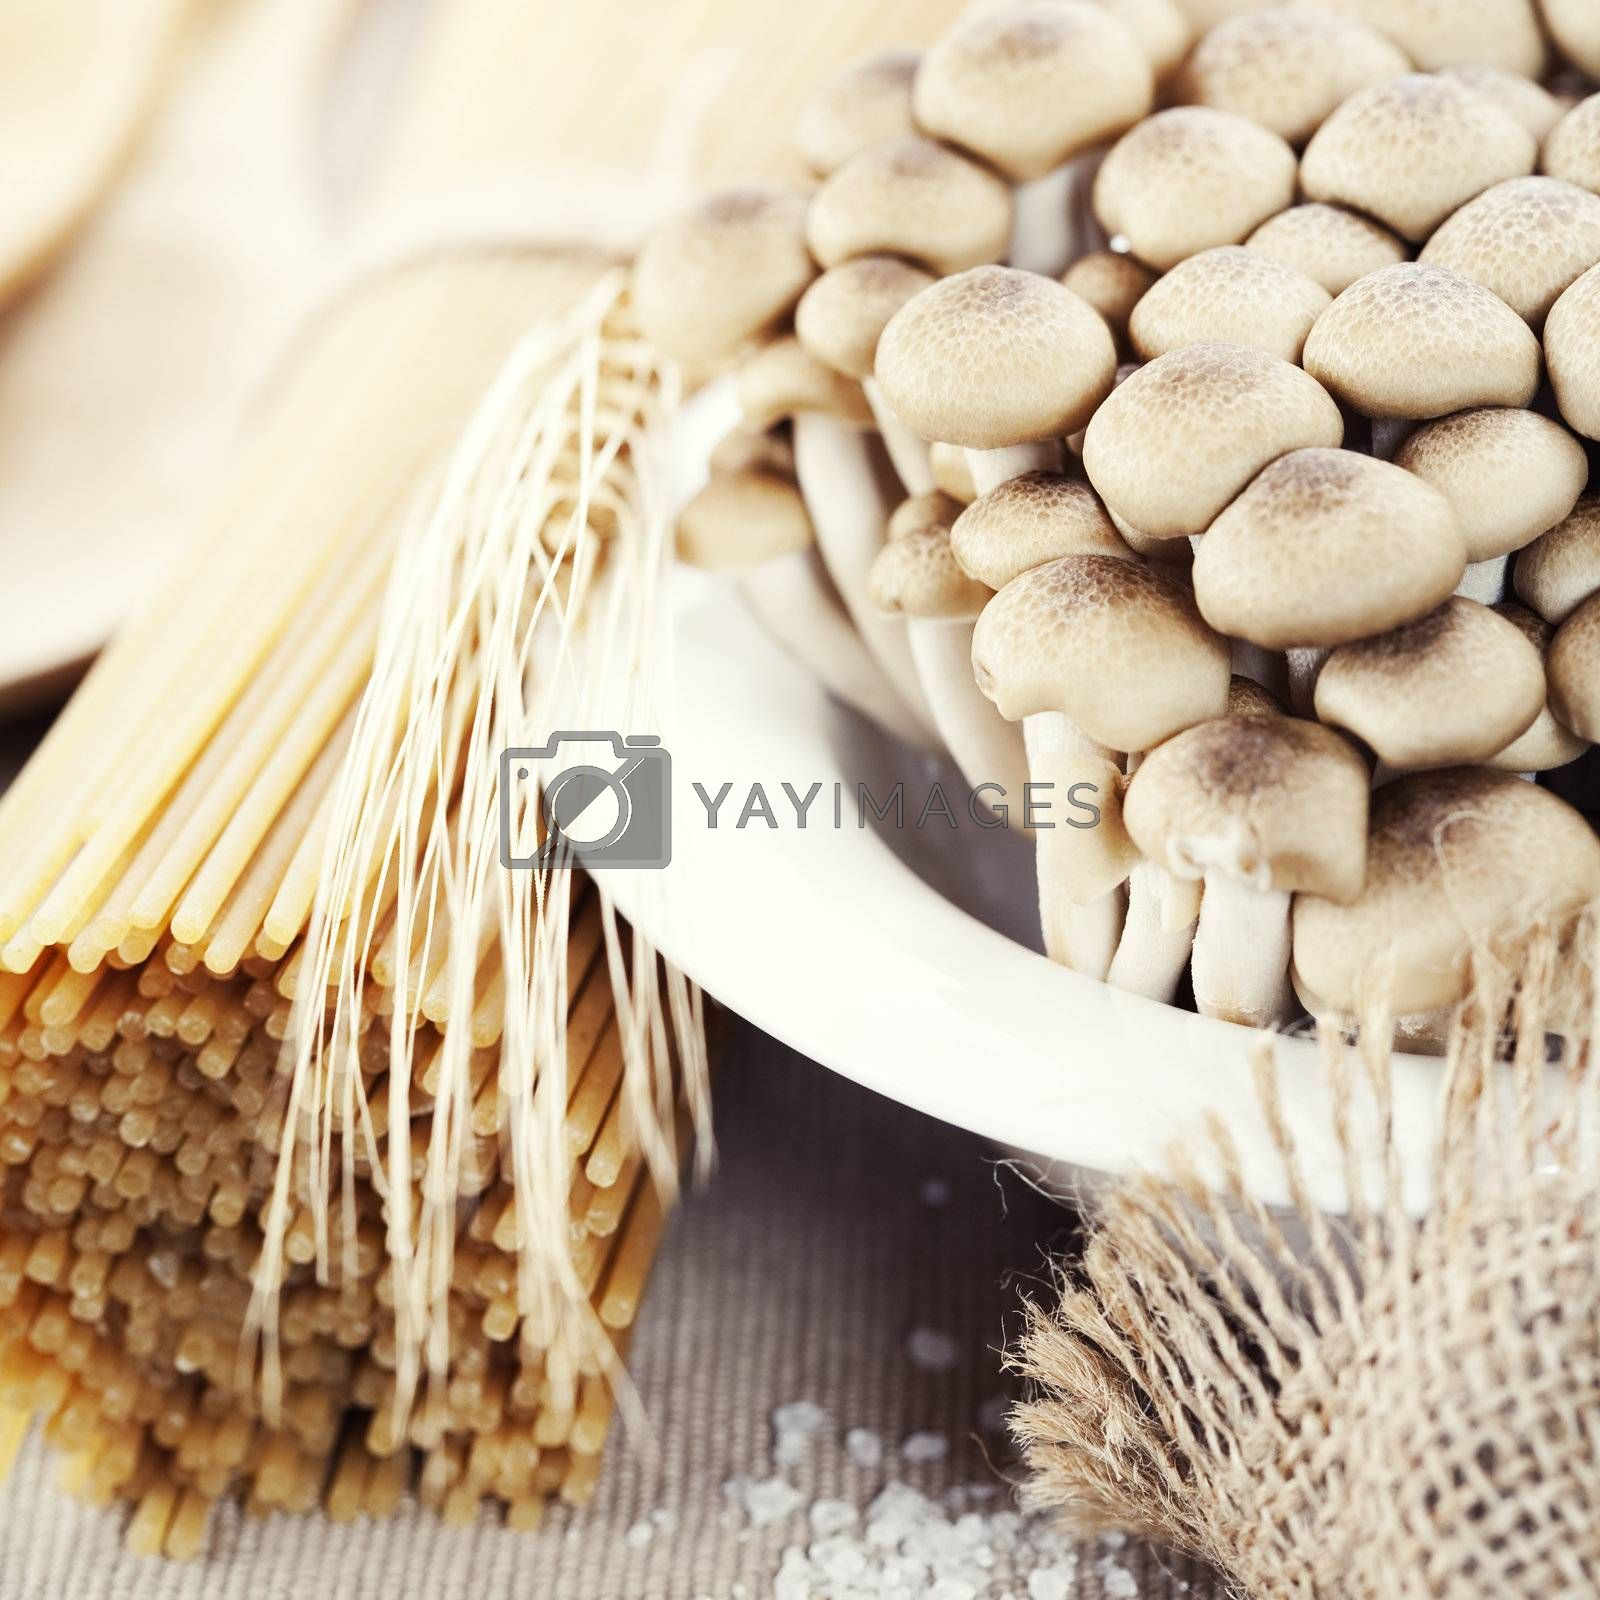 Raw Ingredients For Making Pasta (spaghetti, mushrooms)